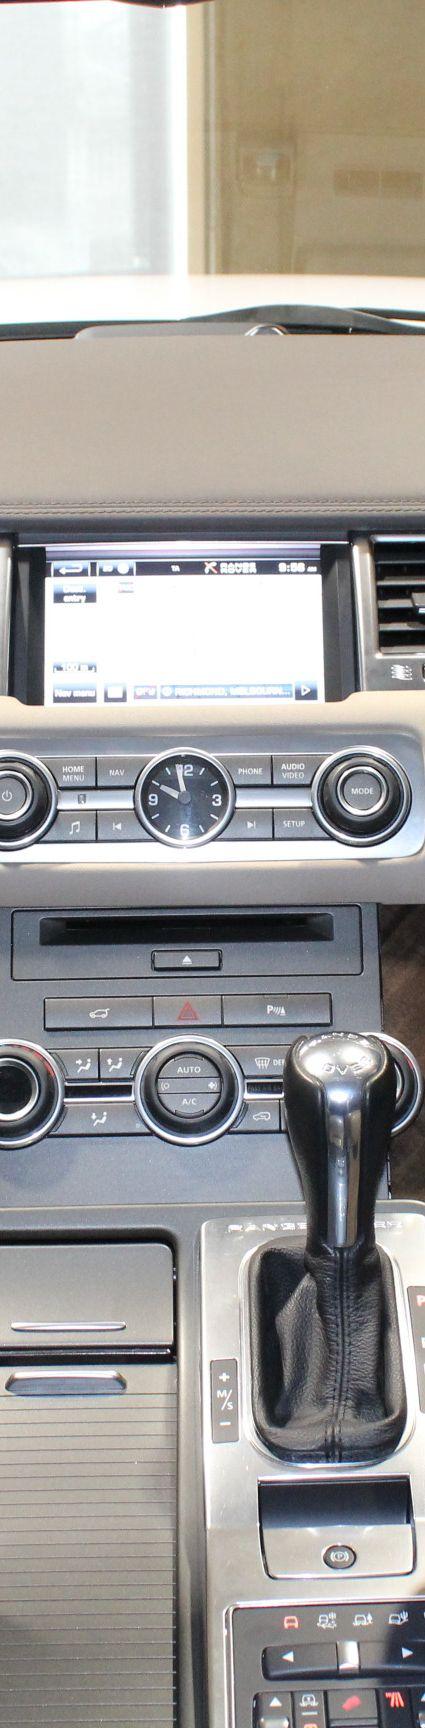 2012 Land Rover Range Rover Sport L320 SDV6 Luxury - for sale in Australia